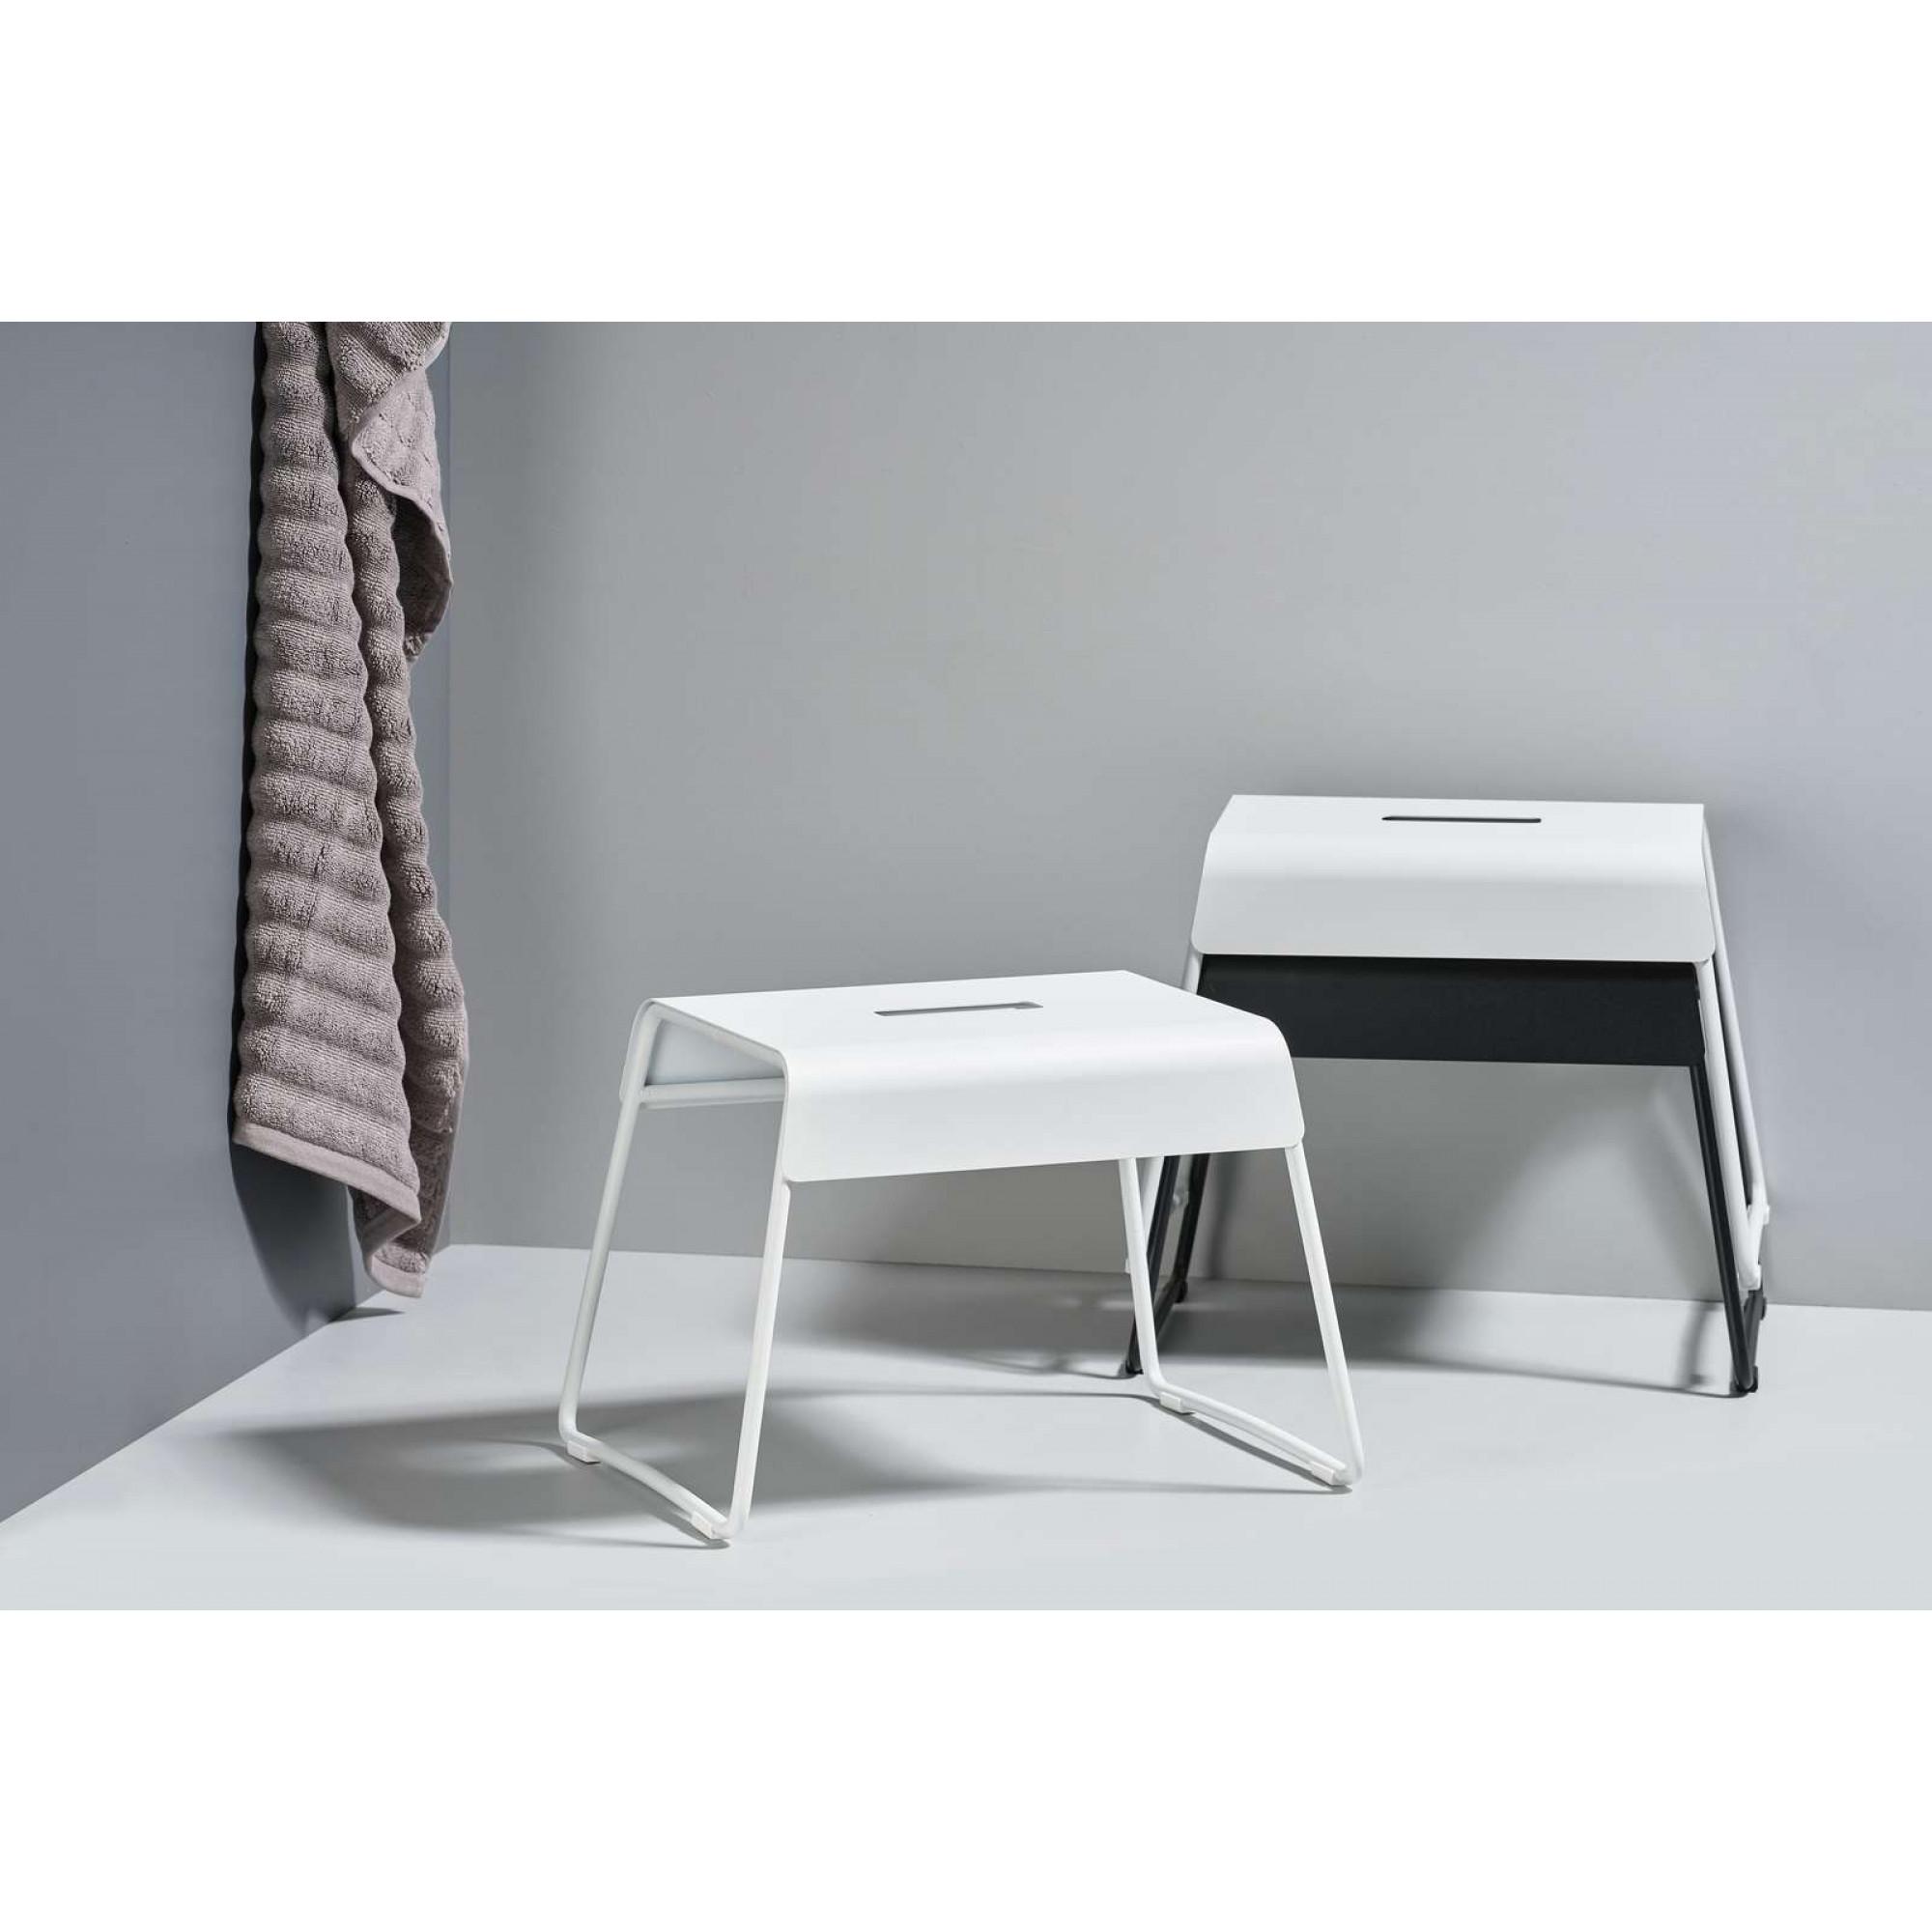 Tabouret A-stool | Blanc